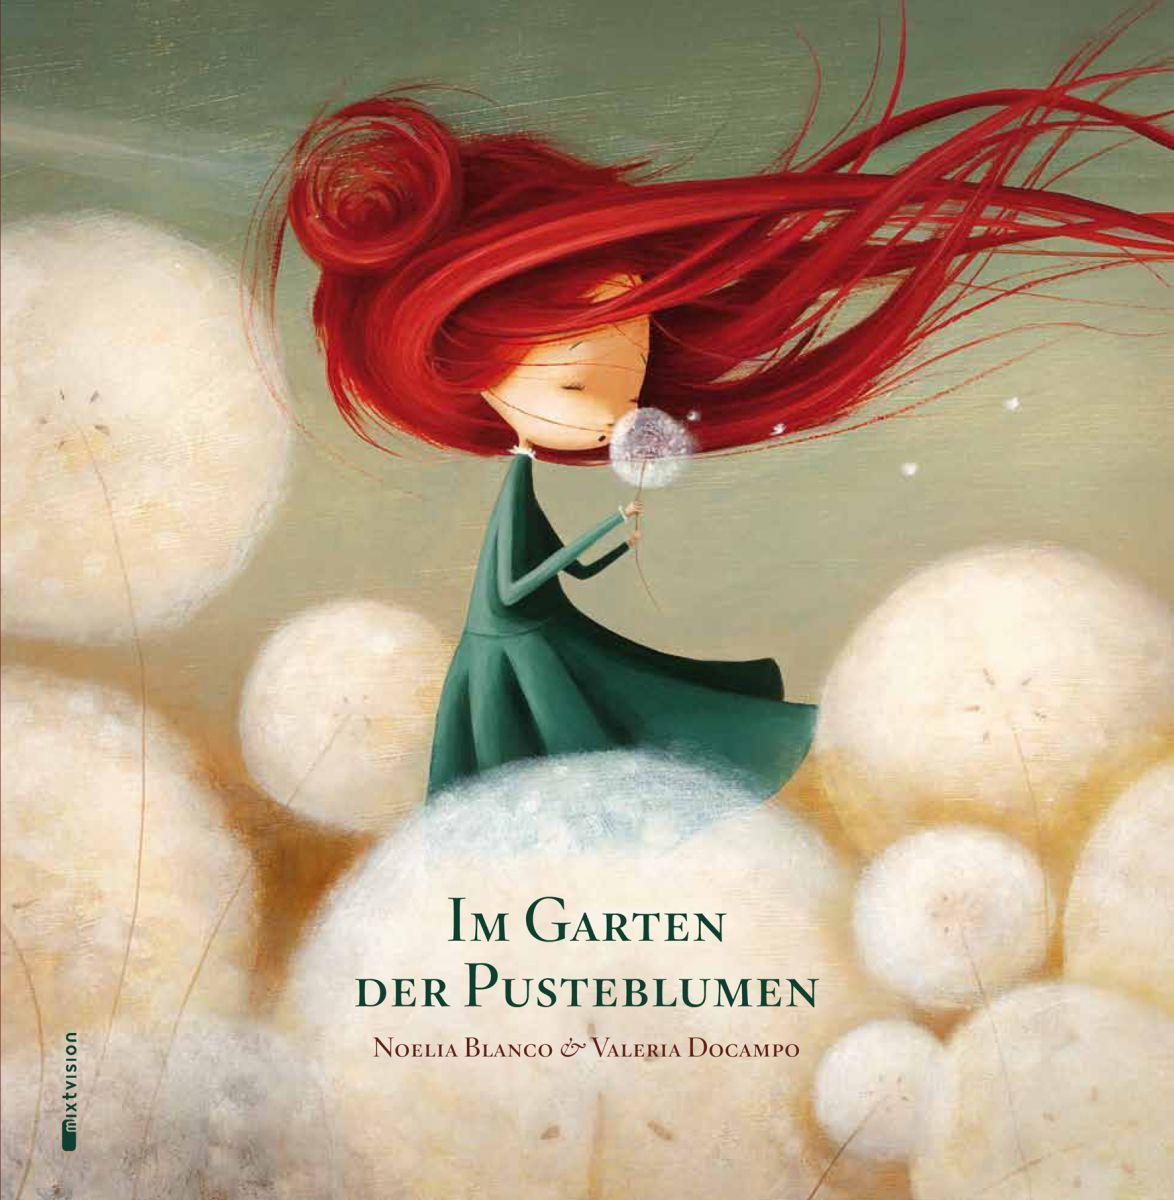 Im-Garten-der-Pusteblumen-Cover-Noelia-Blanco-Valeria-Docampo-mixtvision